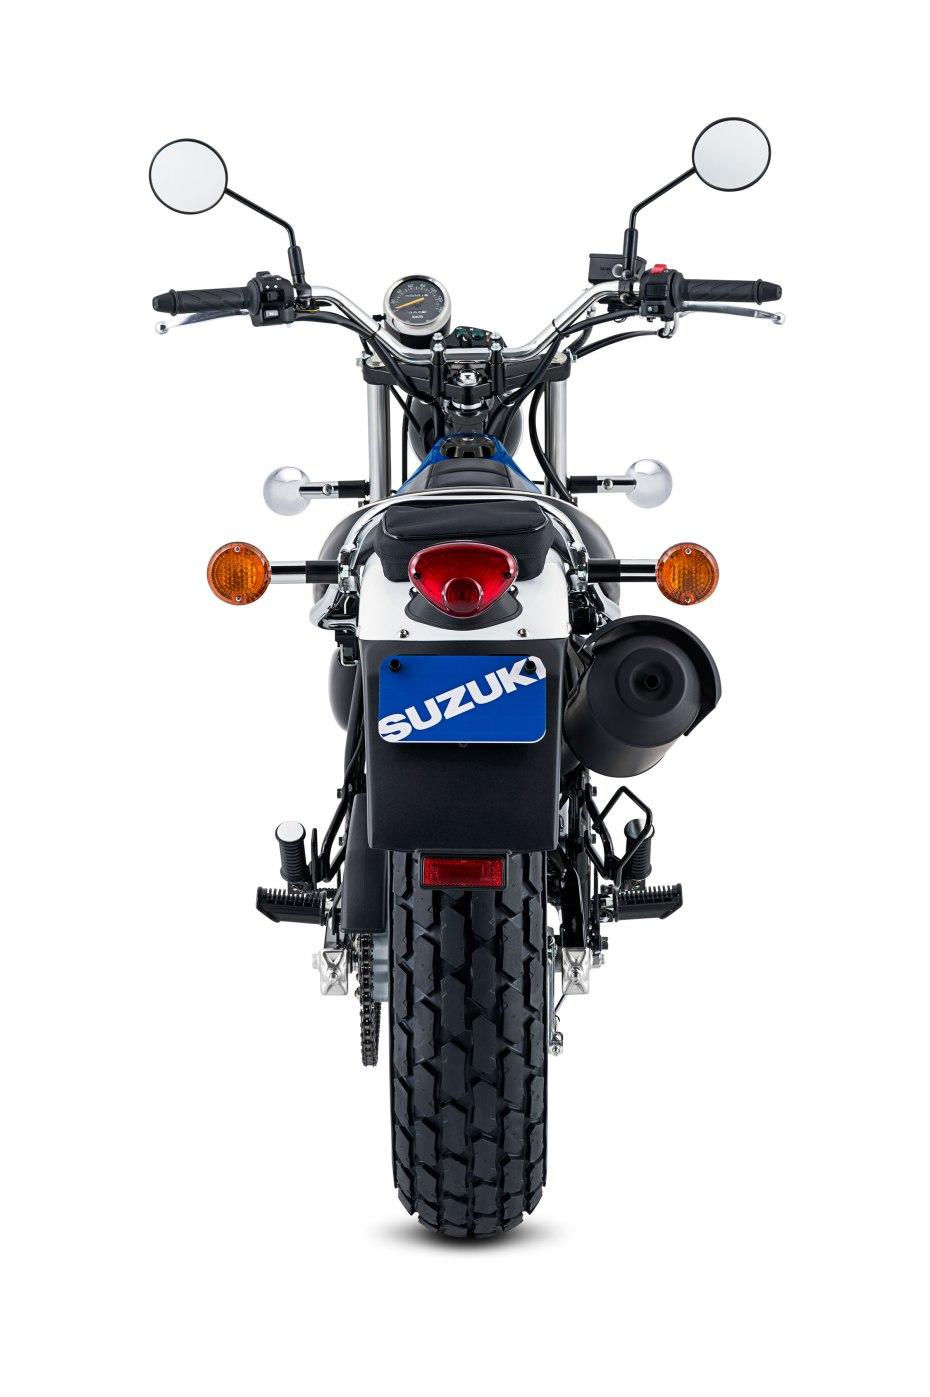 2017-Suzuki-New-Motorcycle-Releases